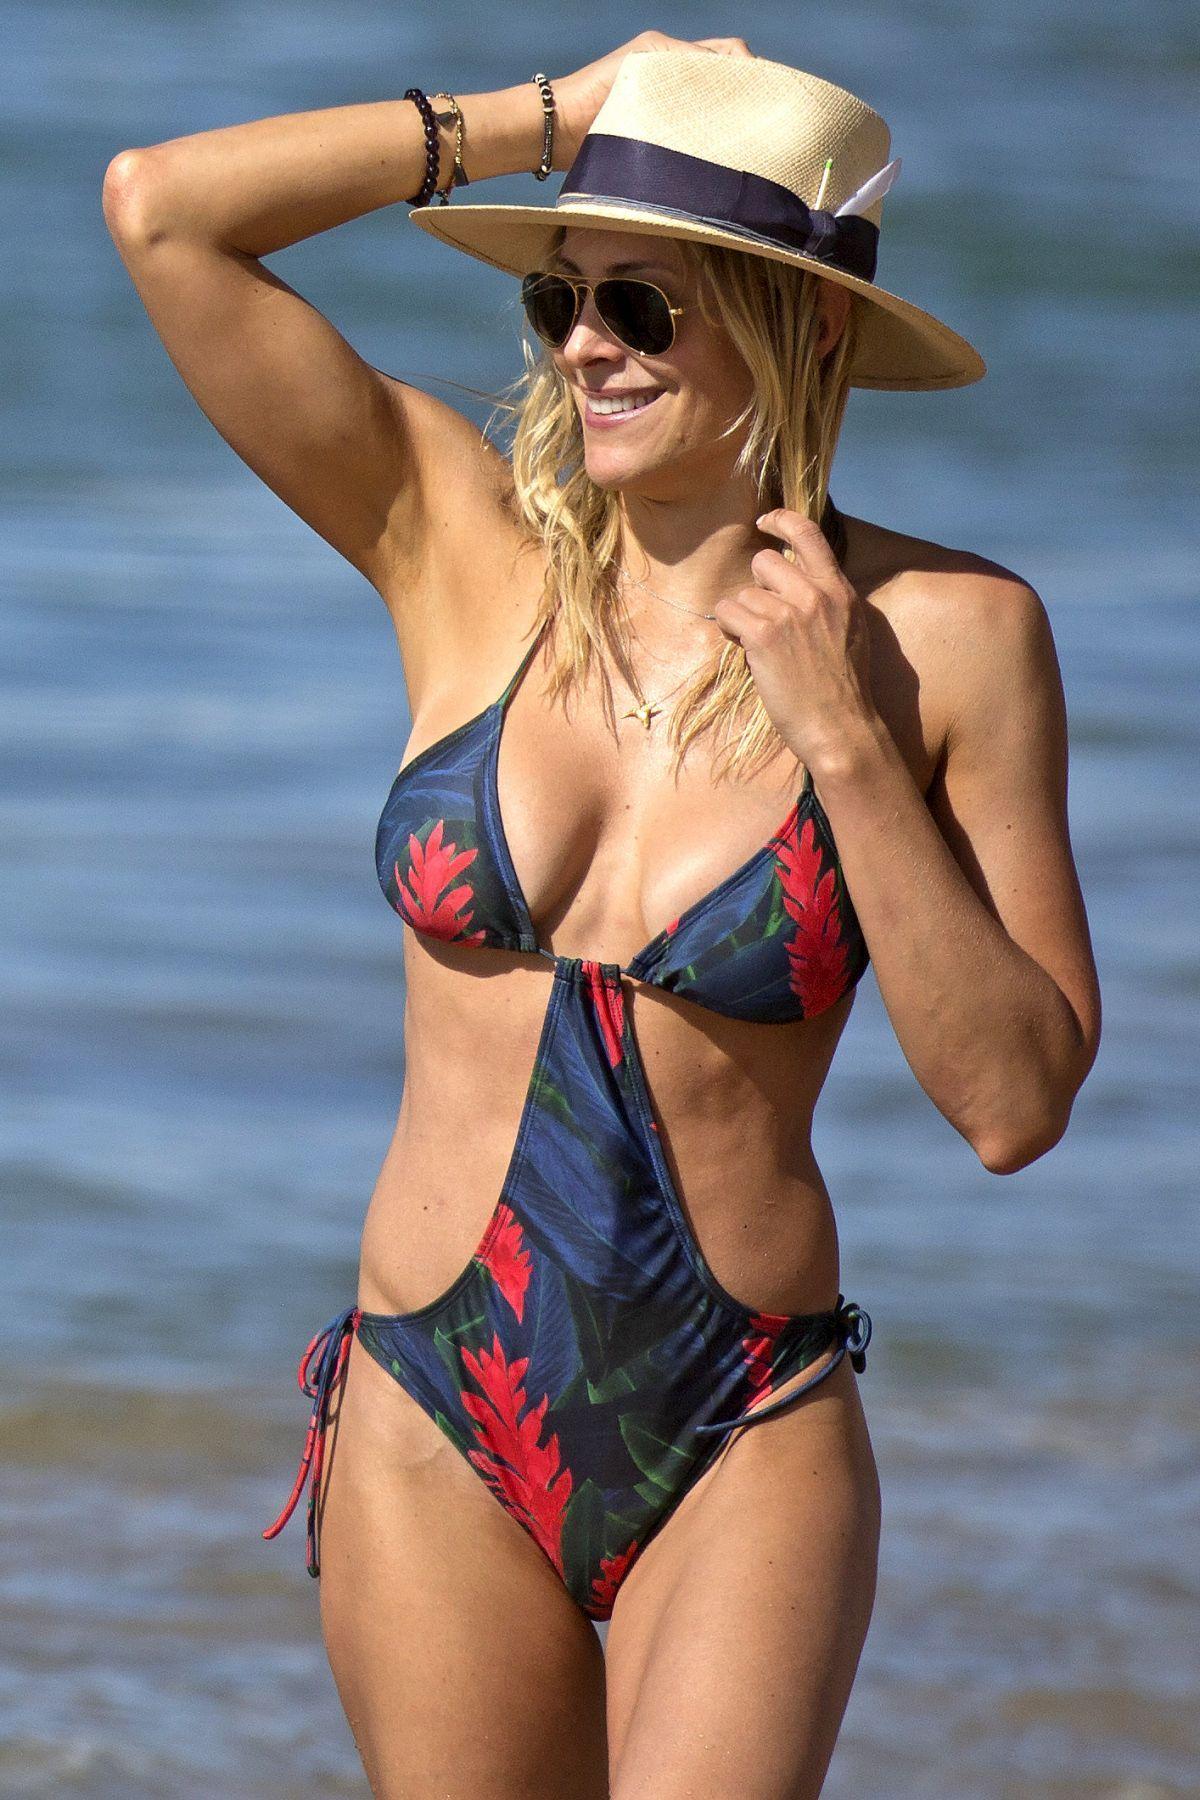 Bikini Amber Sym nudes (73 photos), Paparazzi